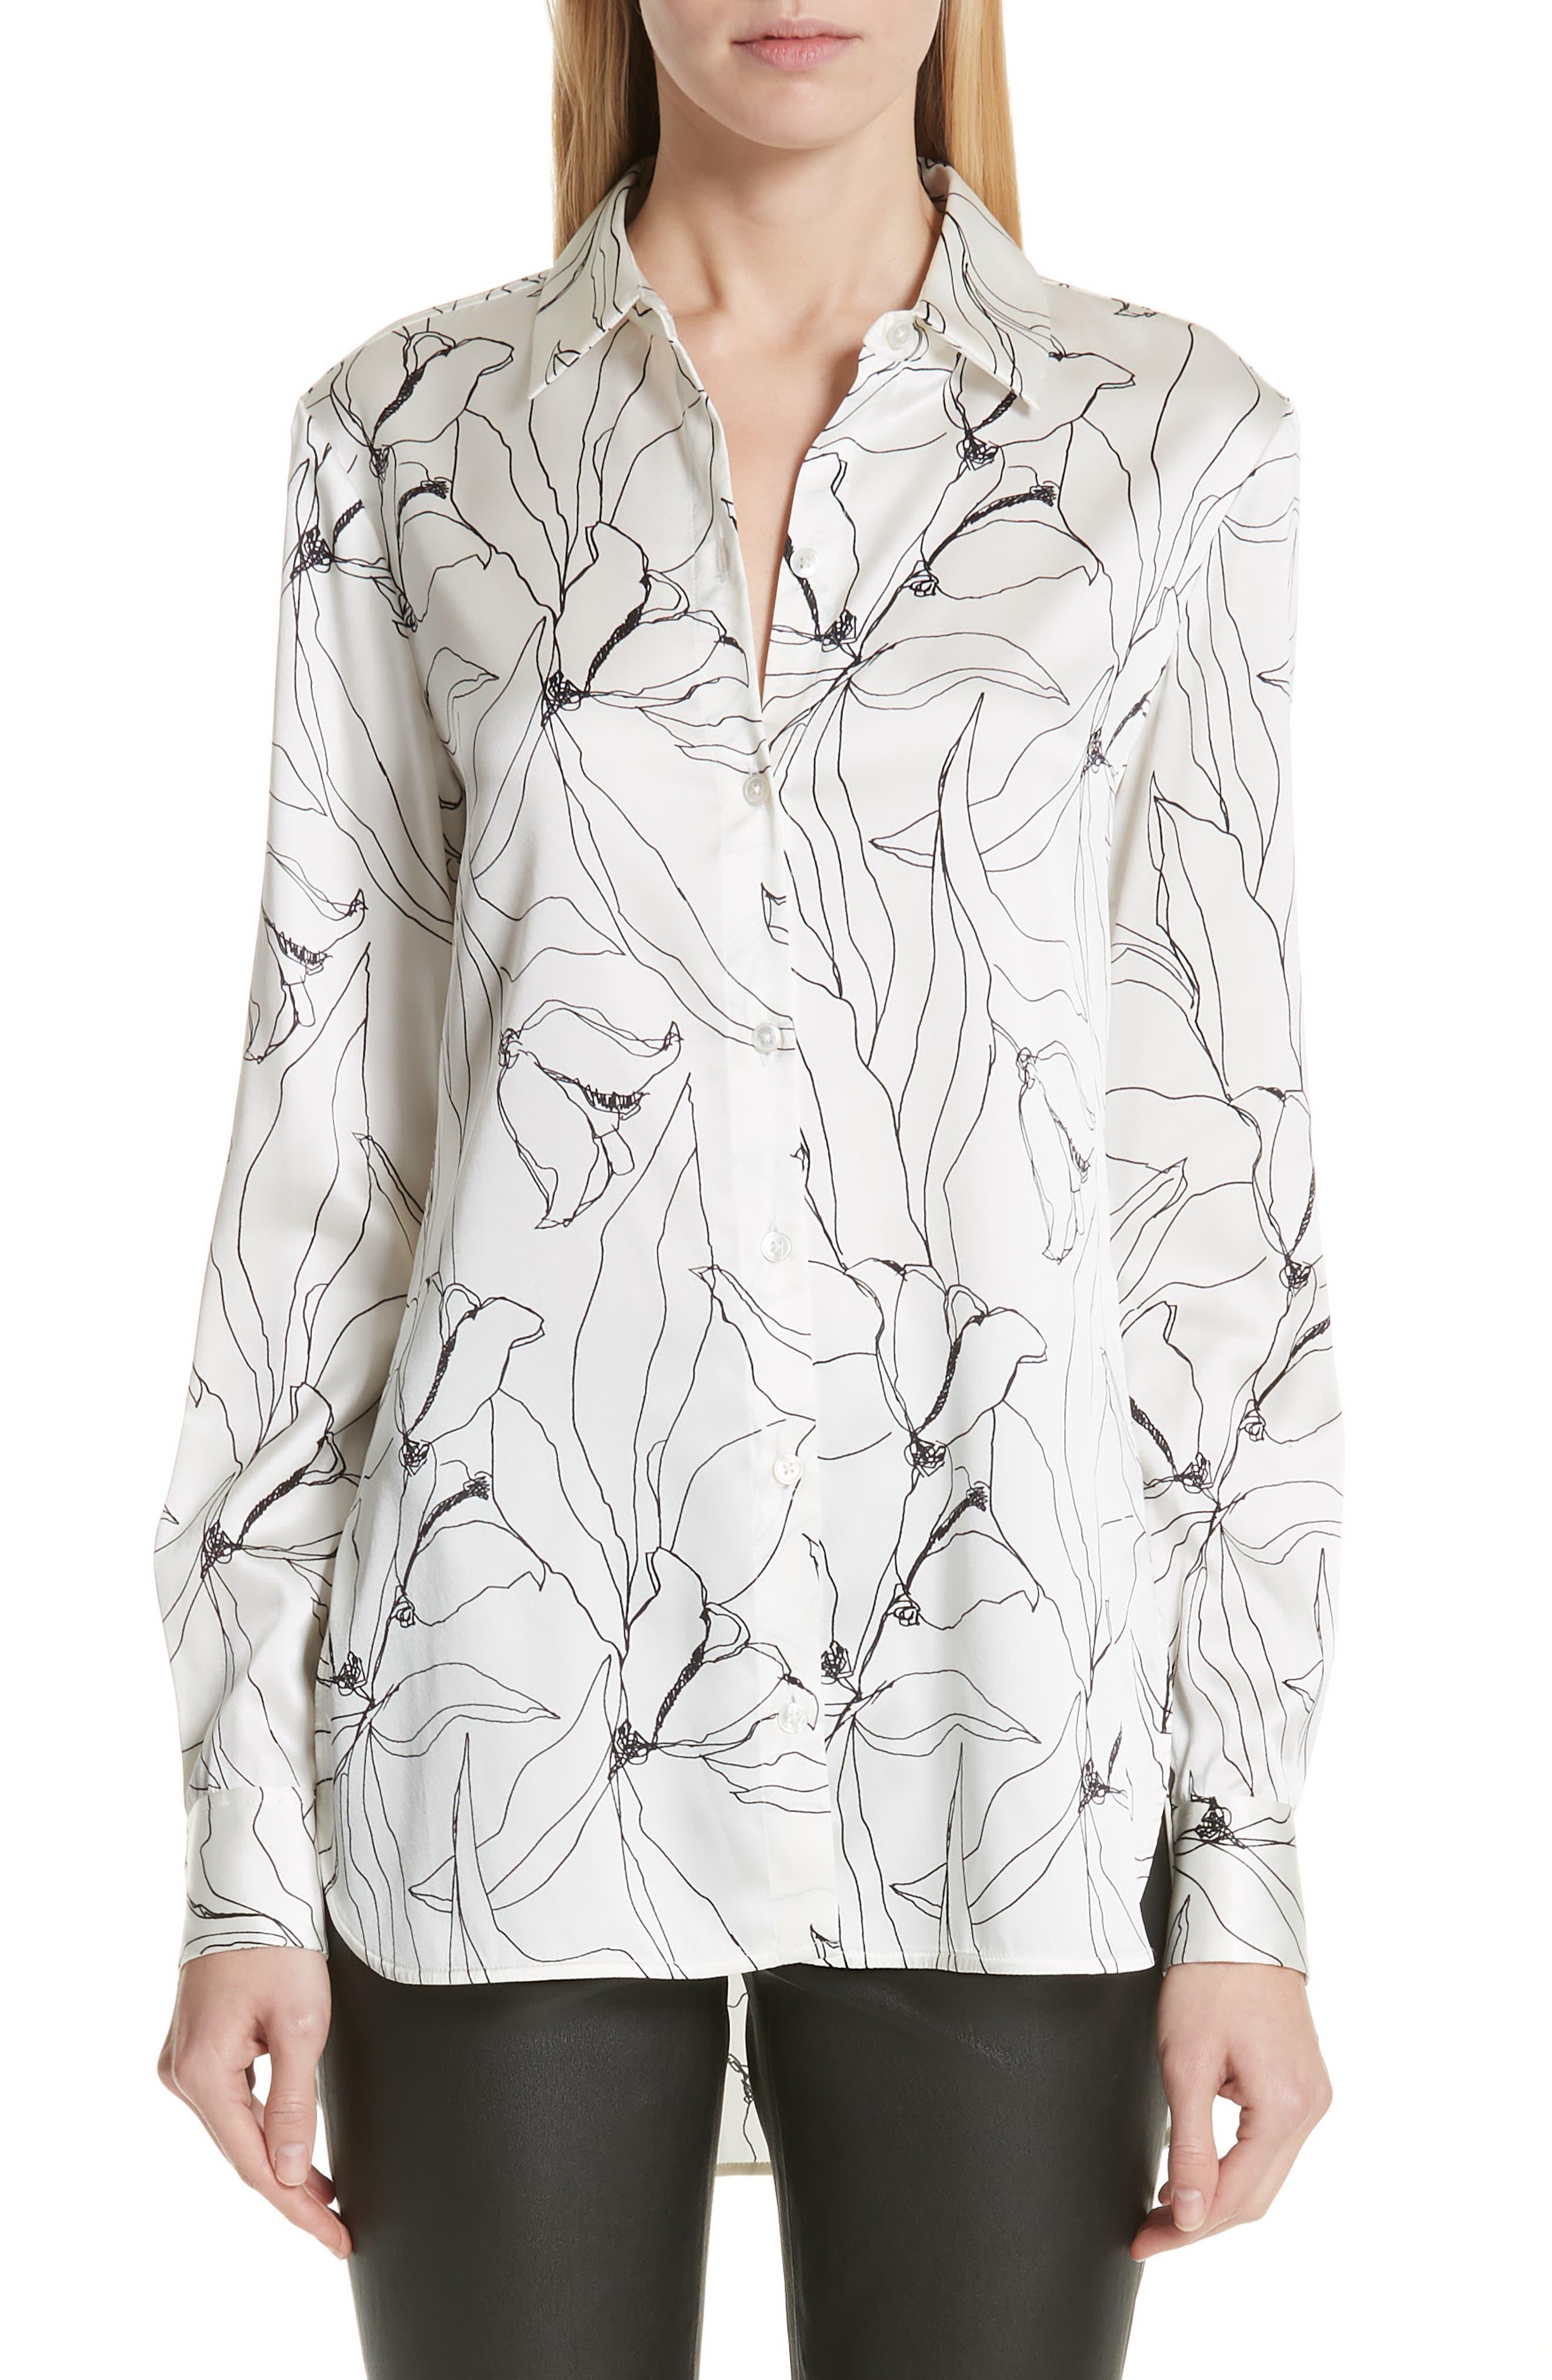 ST. JOHN COLLECTION,                             Artisanal Floral Stretch Silk Blouse,                             Main thumbnail 1, color,                             CREAM/ CAVIAR